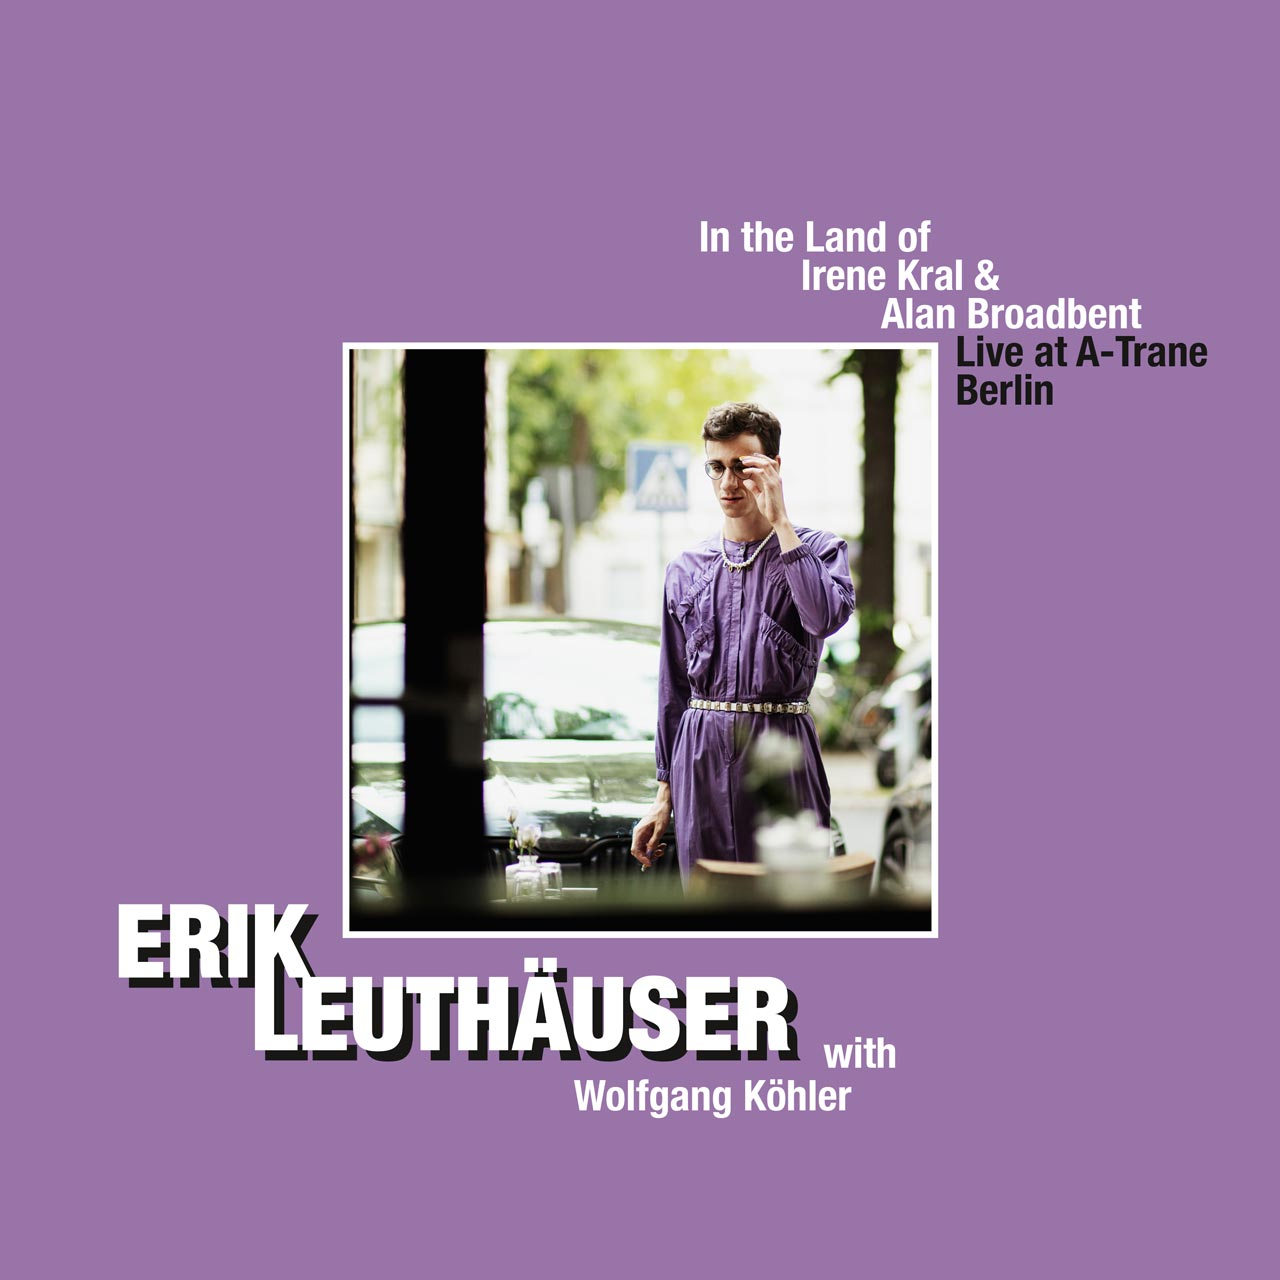 CD-Tipp: Leuthäuser/Köhler: In The Land Of Irene Kral & Alan Broadbent